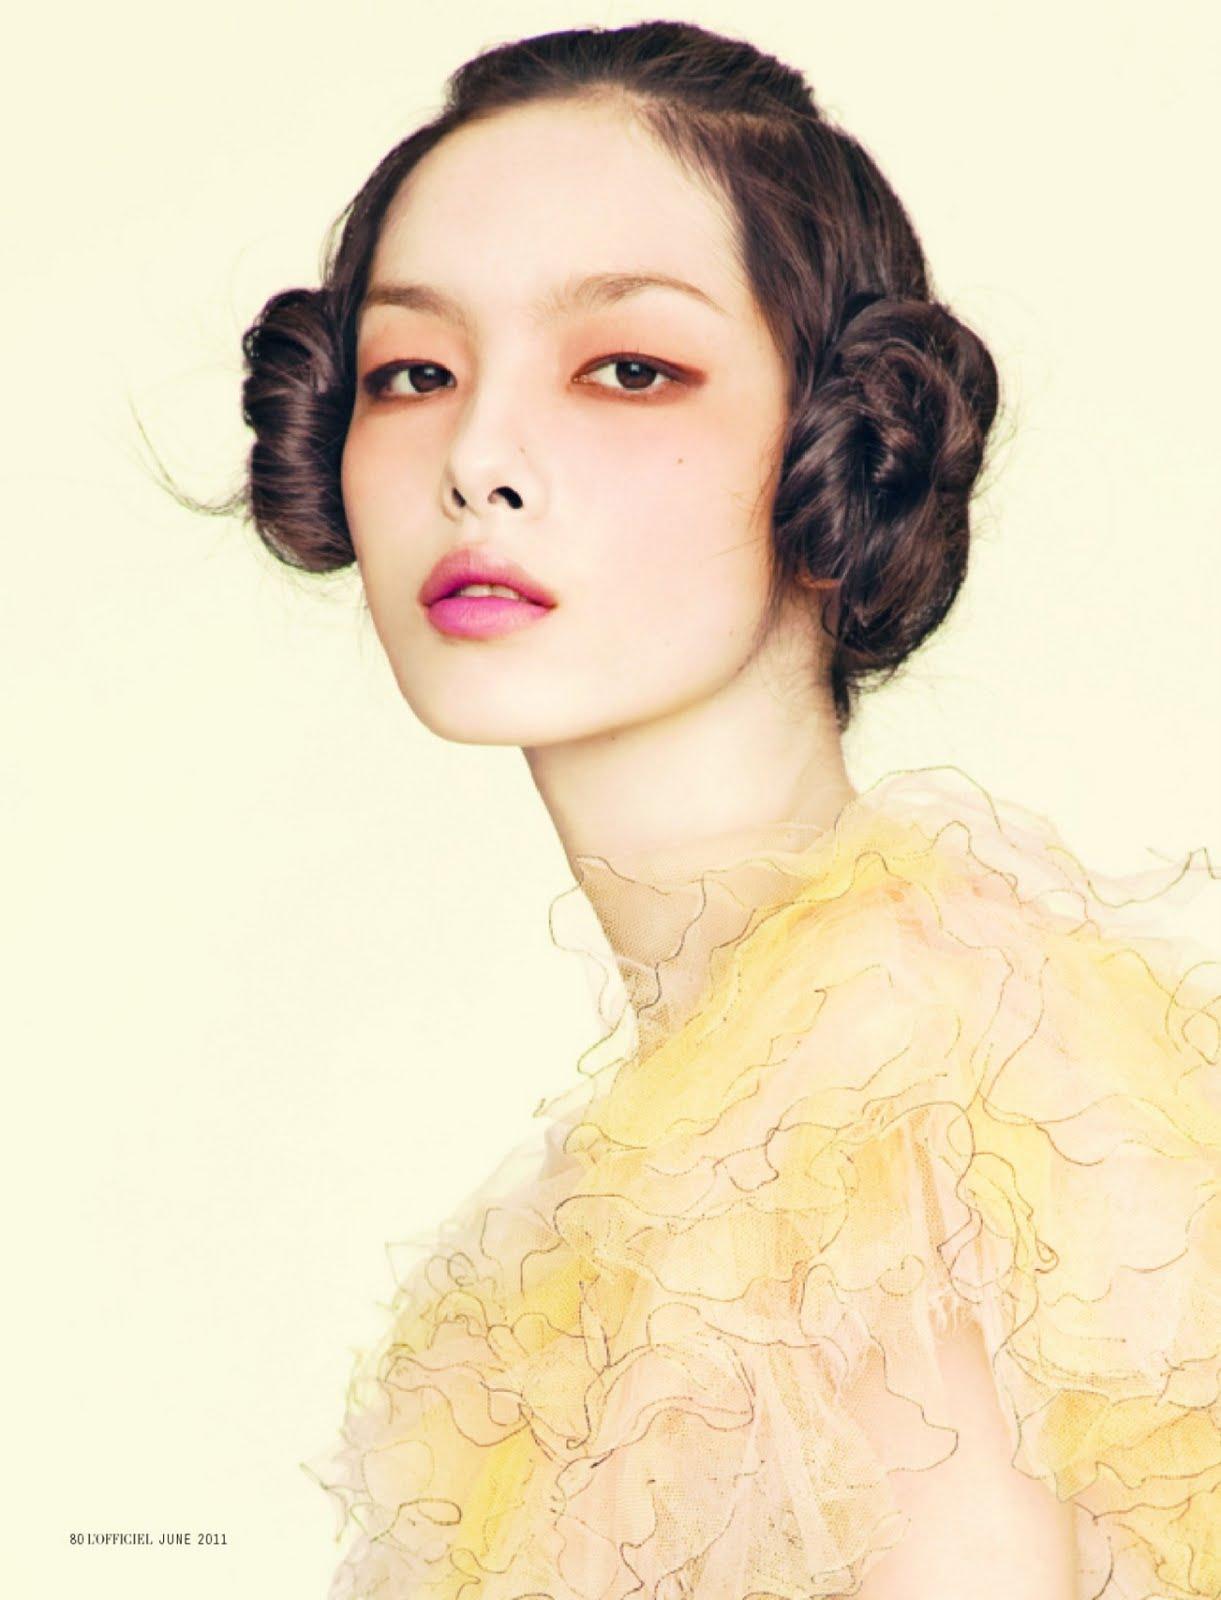 Sun+Feifei+by+Sun+Jun+%28Impressionism+-+L%E2%80%99Officiel+China+June+2011%29.jpg